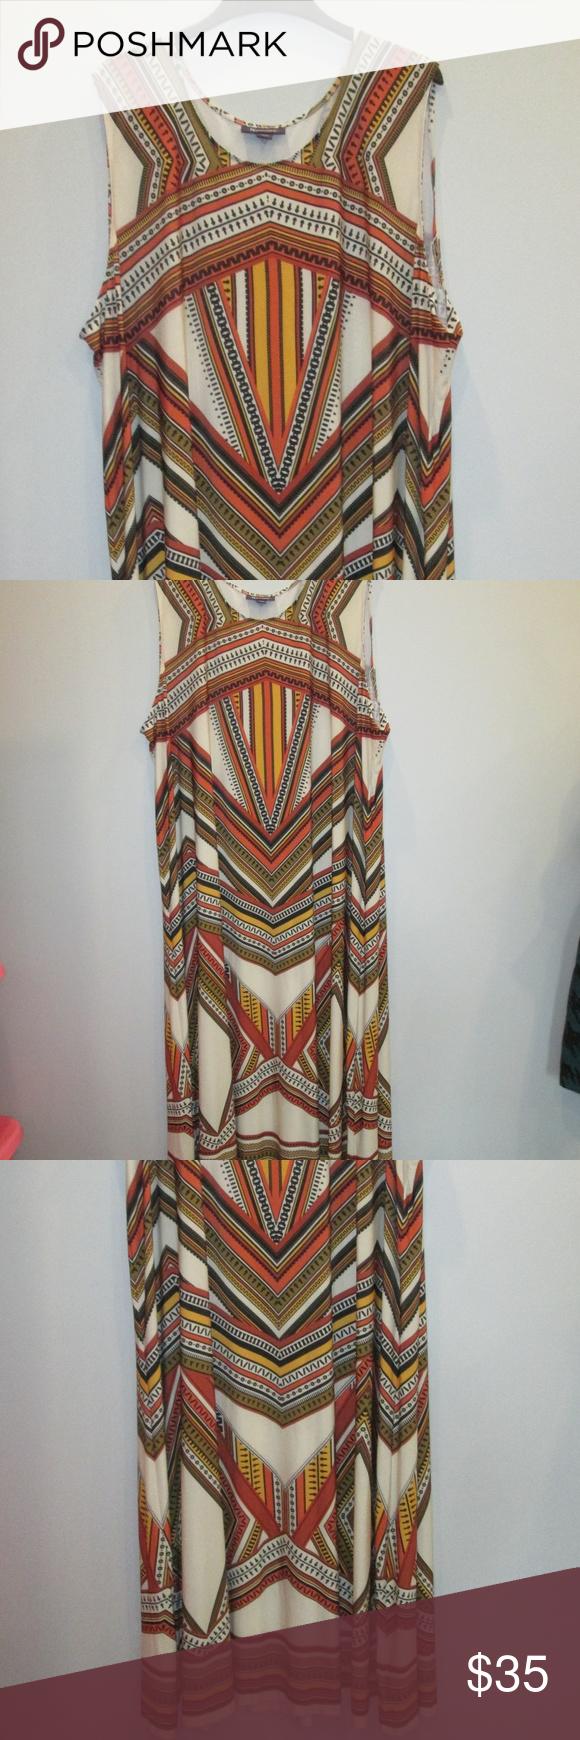 Roaman S Plus Size Maxi Dress 5x Aztec Design Plus Size Maxi Plus Size Maxi Dresses Maxi Dress [ 1740 x 580 Pixel ]